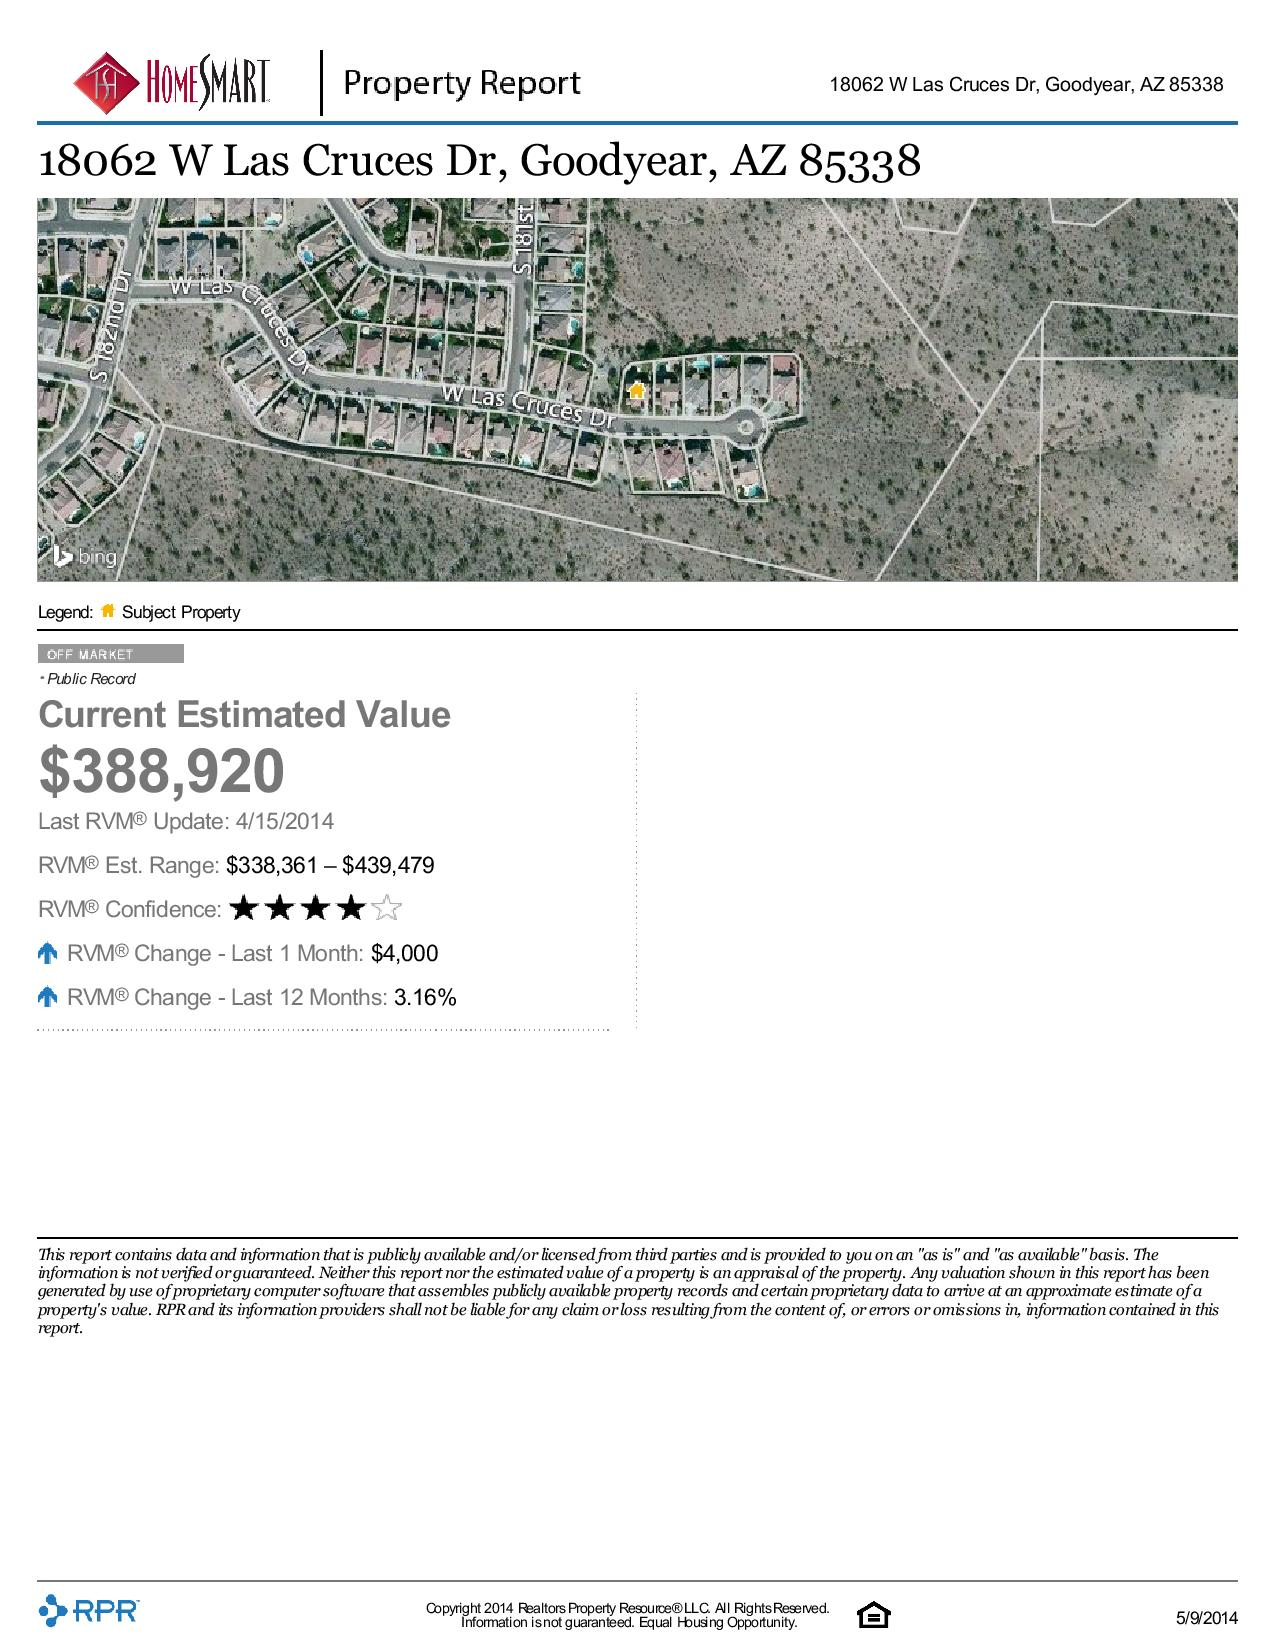 18062-W-Las-Cruces-Dr-Goodyear-AZ-85338-page-002